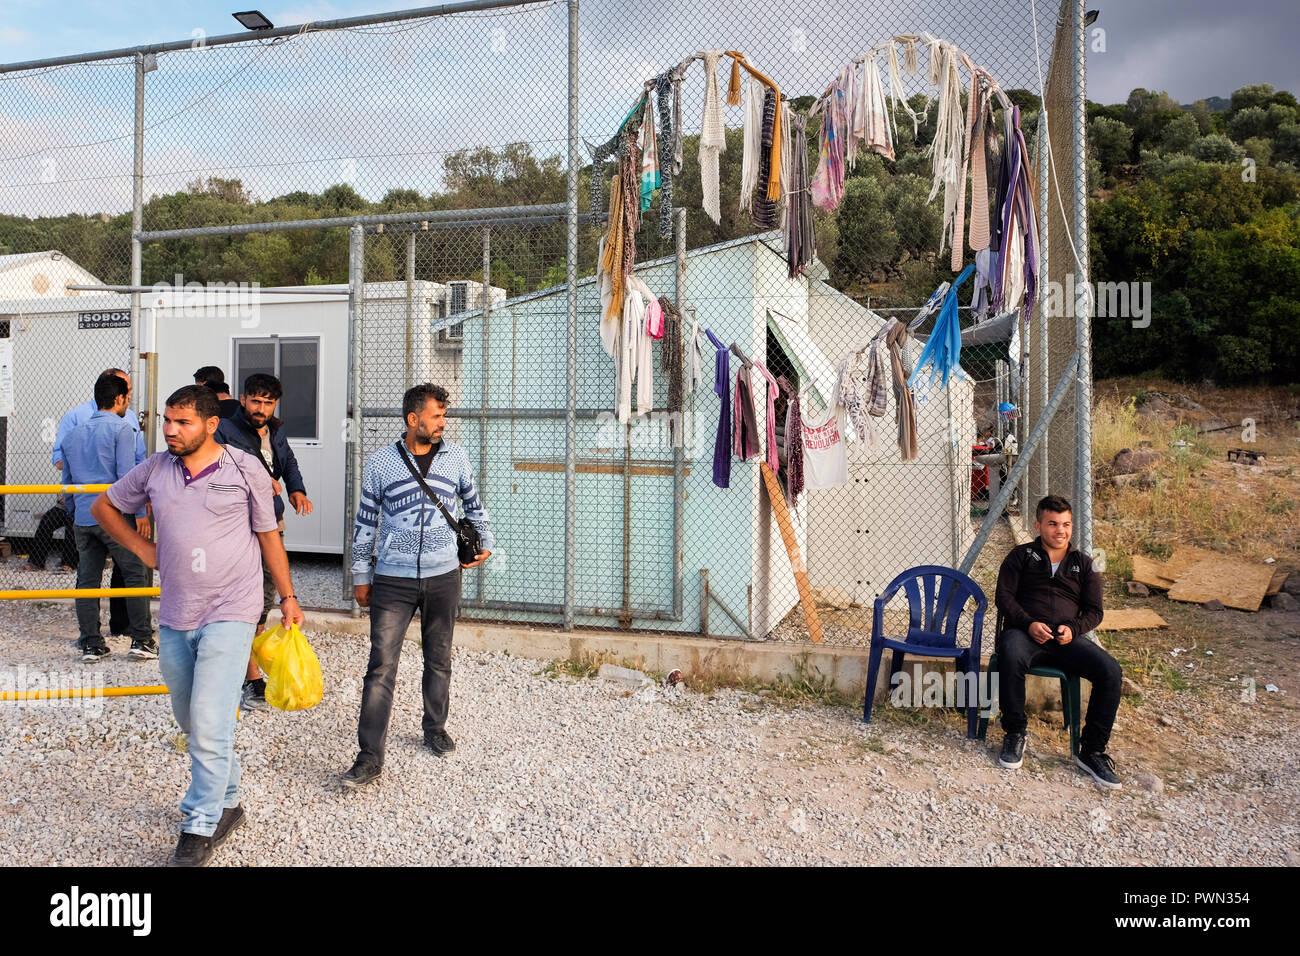 Refugees in front of the first station of the camp MORIA CAMP for refugees. Island of Lesbos, Greece, May 2018 - Flüchtlinge vor dem ersten Station des Lagers MORIA CAMP für Flüchtlinge. Insel Lesbos, Griechenland, Mai 2018 - Stock Image